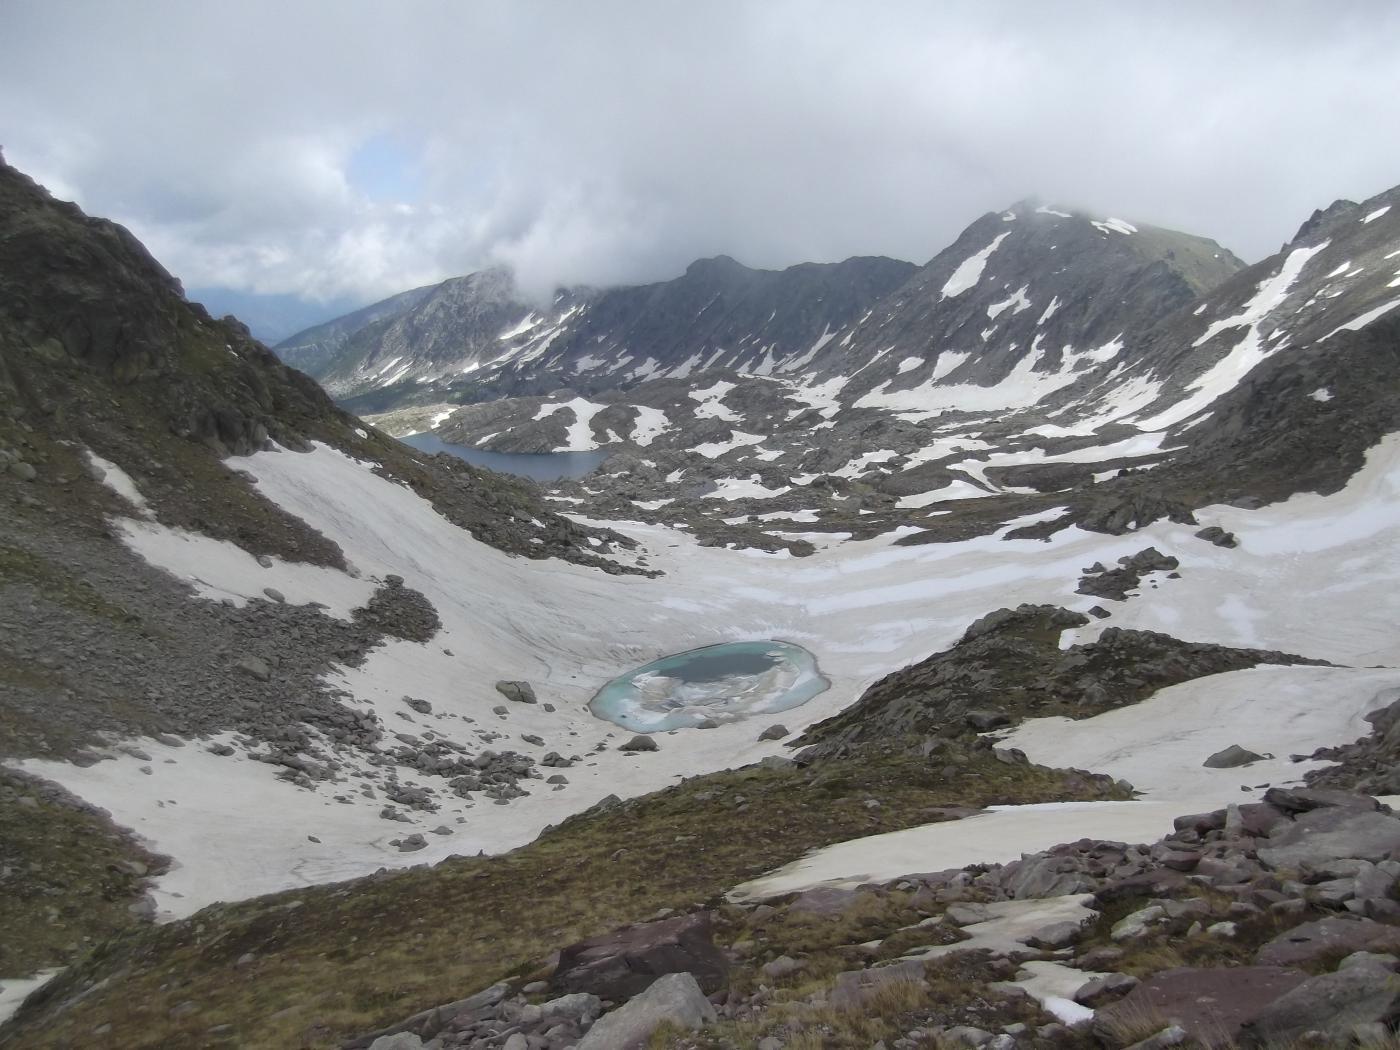 il Lacs du Diable e la Valle delle Meraviglie